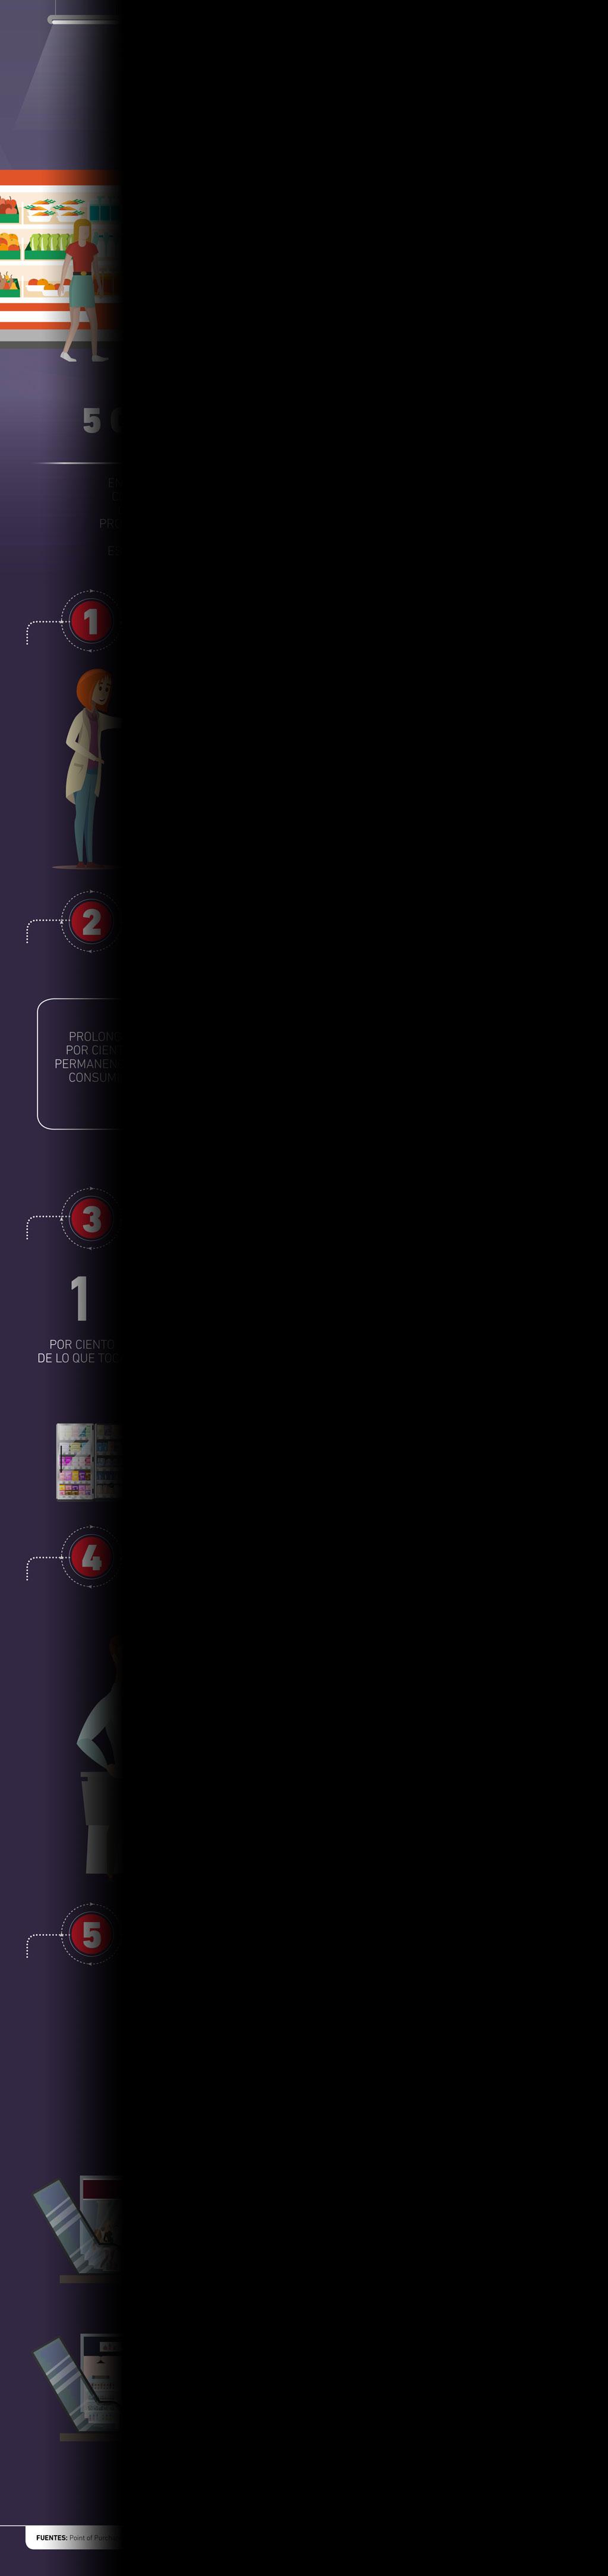 224.-Infografía_Marketing-olfativo_degradado